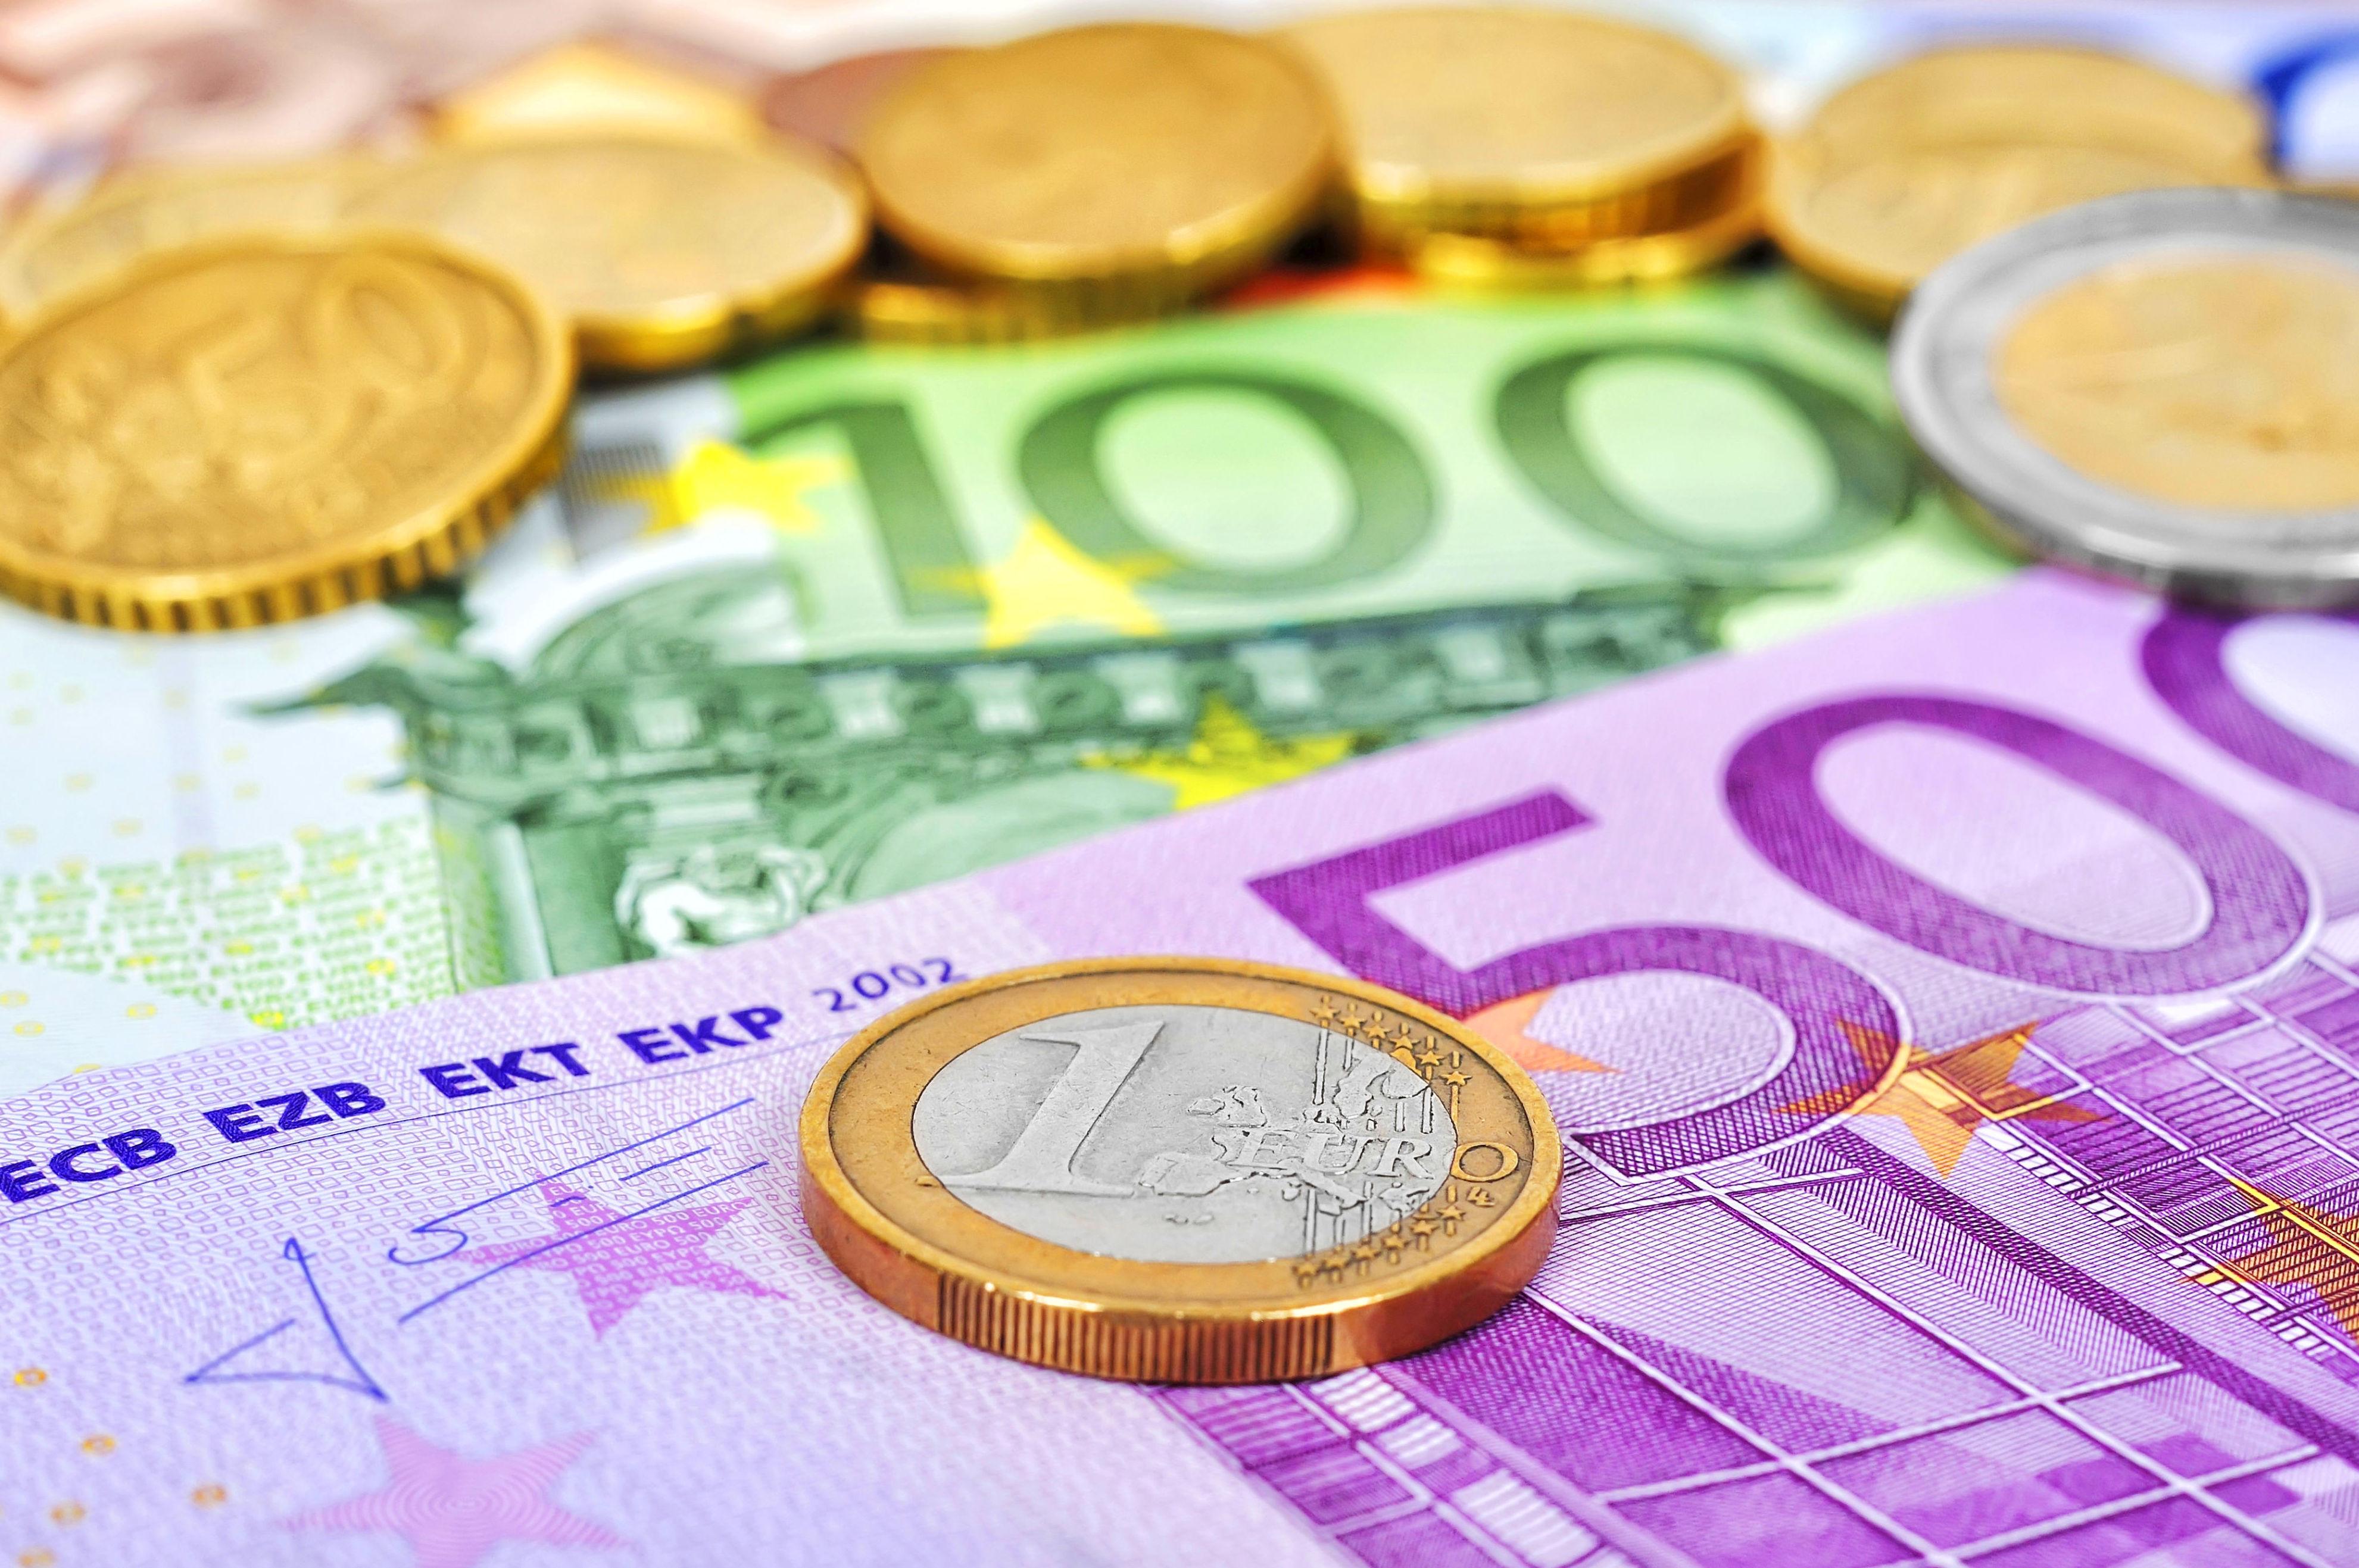 Dinero rápido Financiación inmediata Reunificación de deudas Valencia